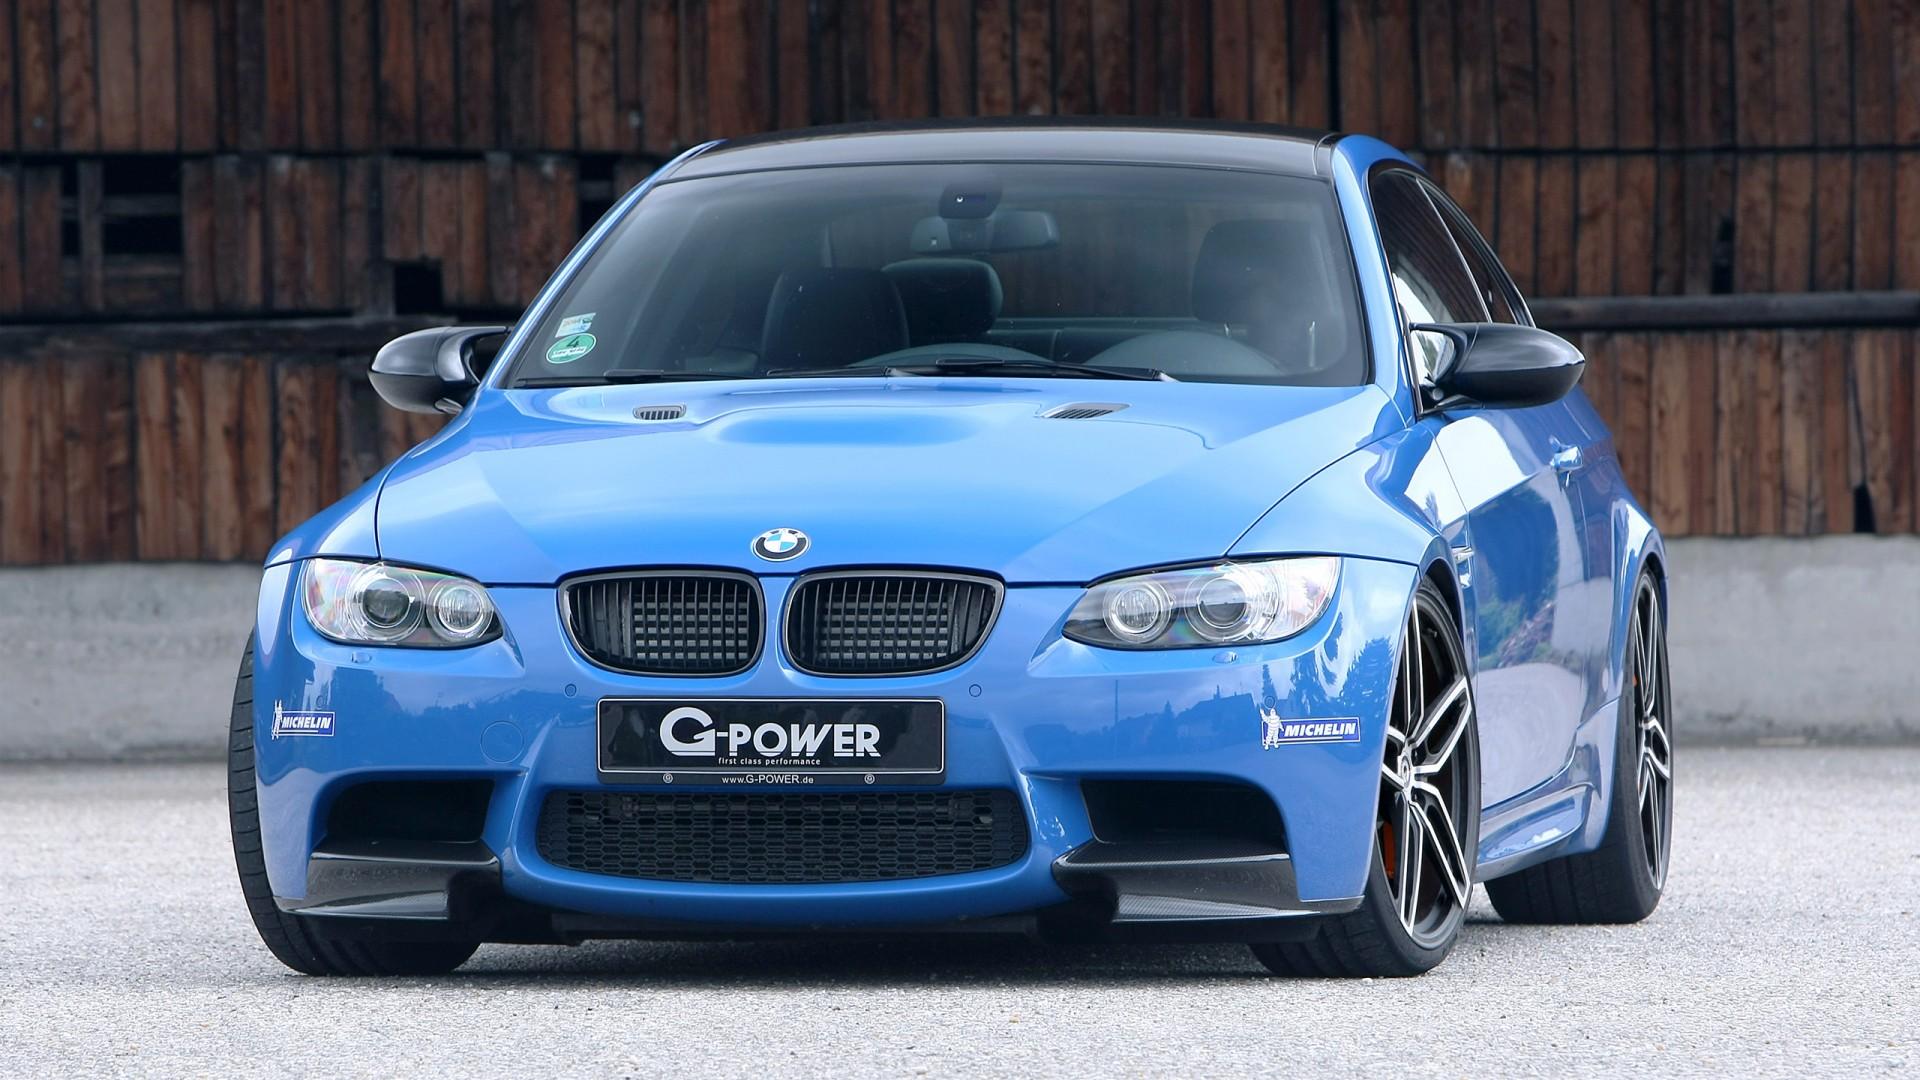 2015 G Power BMW M3 Wallpaper   HD Car Wallpapers   ID #5149